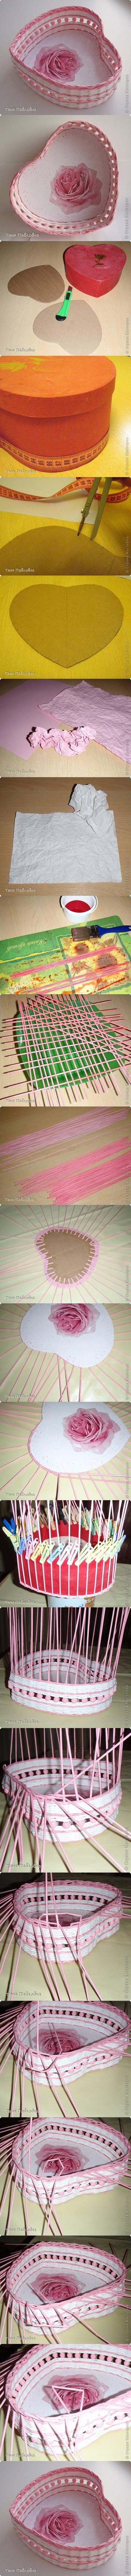 DIY Woven Paper Heart Shaped Basket | iCreativeIdeas.com Like Us on Facebook ==> https://www.facebook.com/icreativeideas